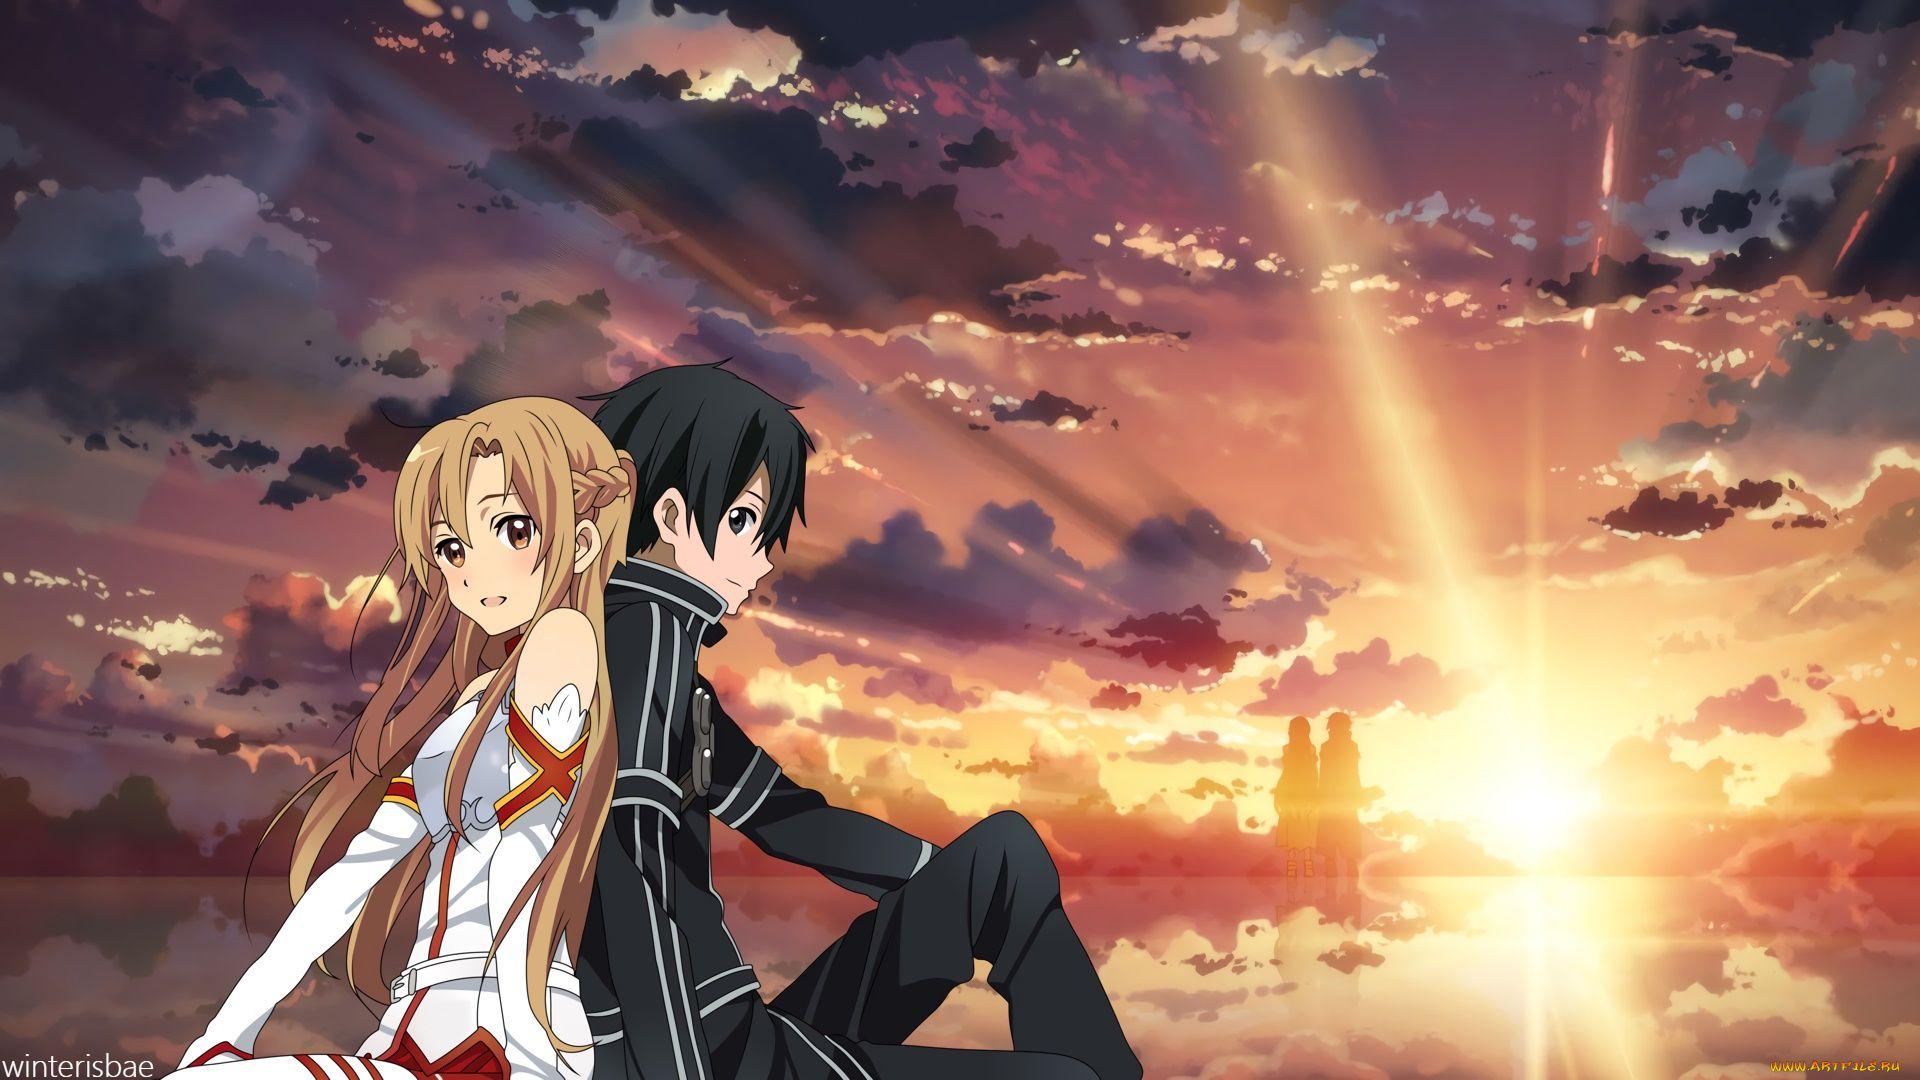 Hd Anime background image